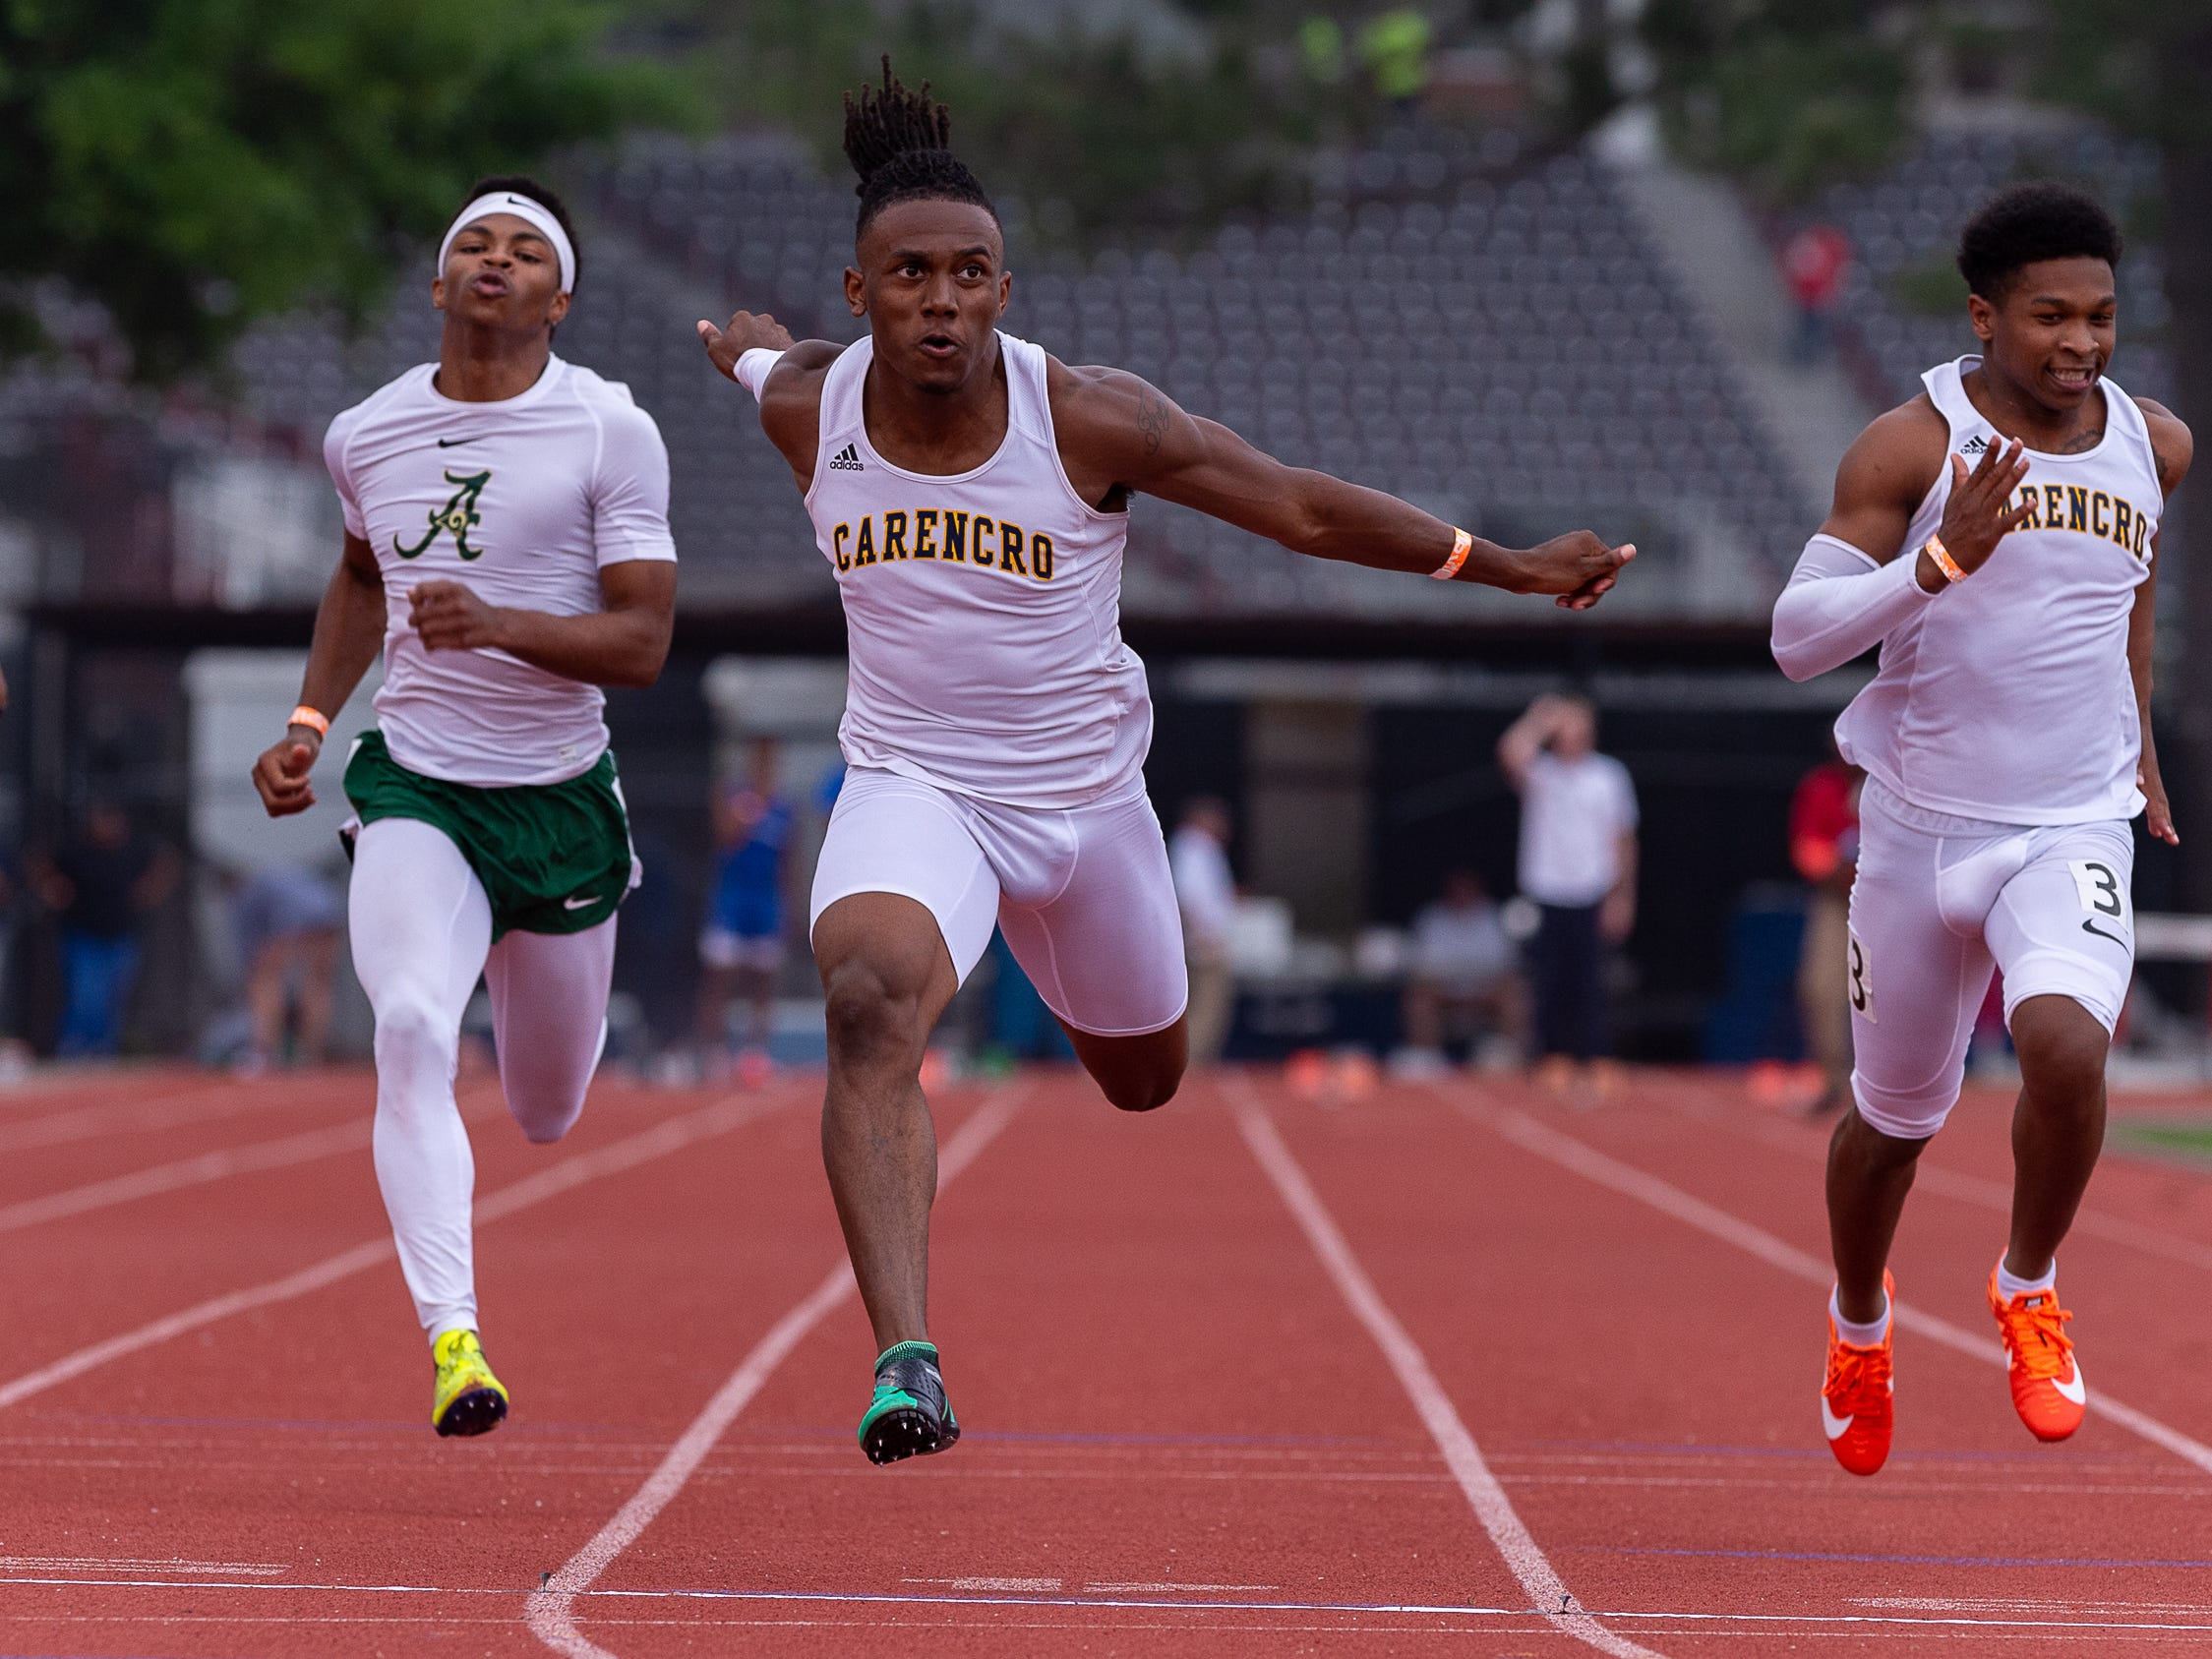 Trejun Jones wins heat 2 of the 100m dash at The 2019 Beaver Club Relays. Friday, April 5, 2019.